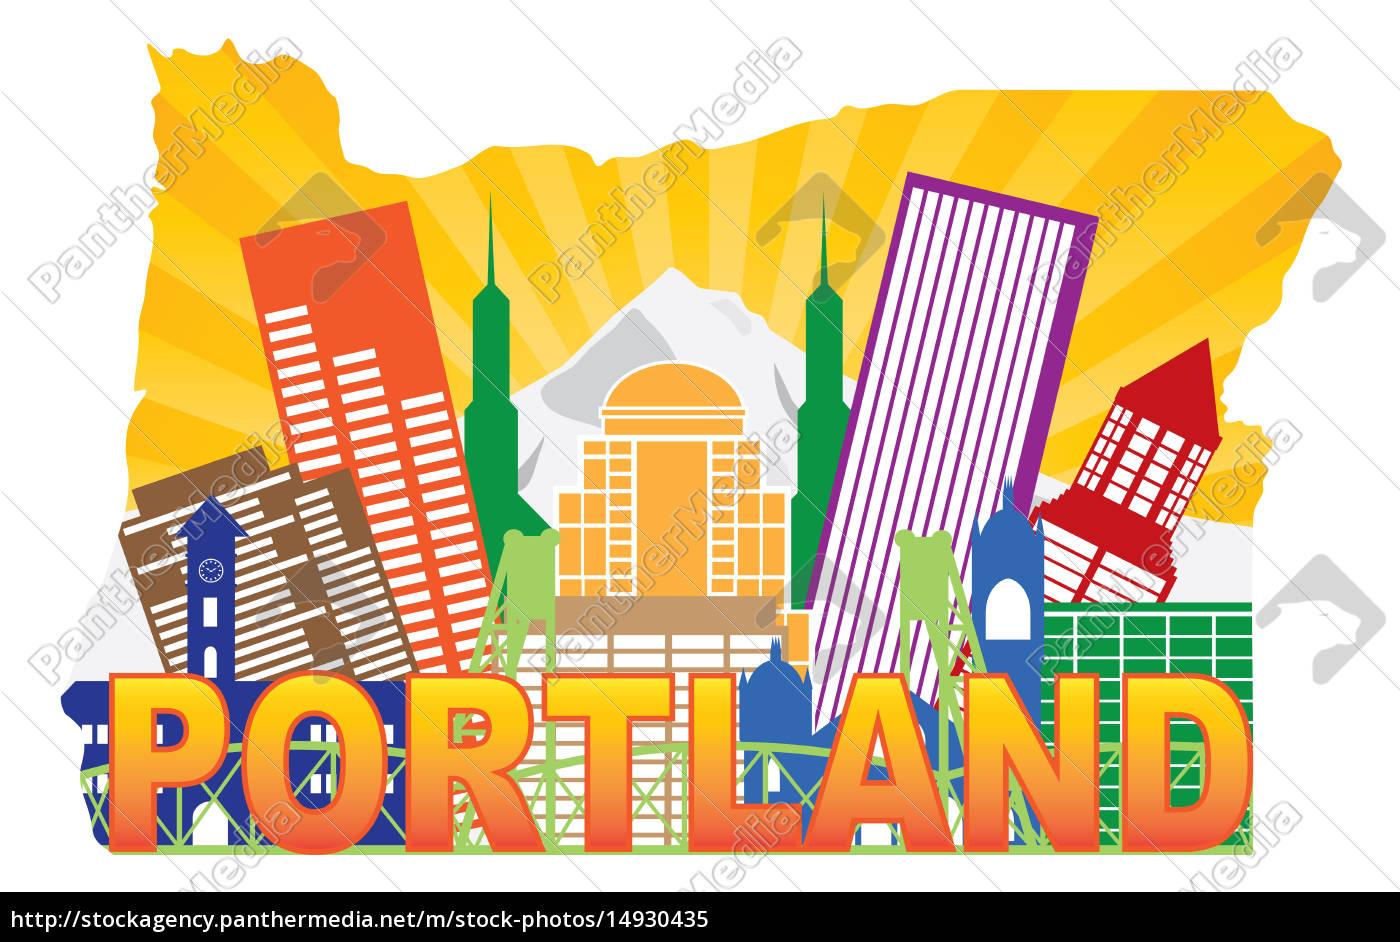 Lizenzfreies Bild 14930435 - Portland Oregon USA Skyline and Mt Hood in  State Map Outline